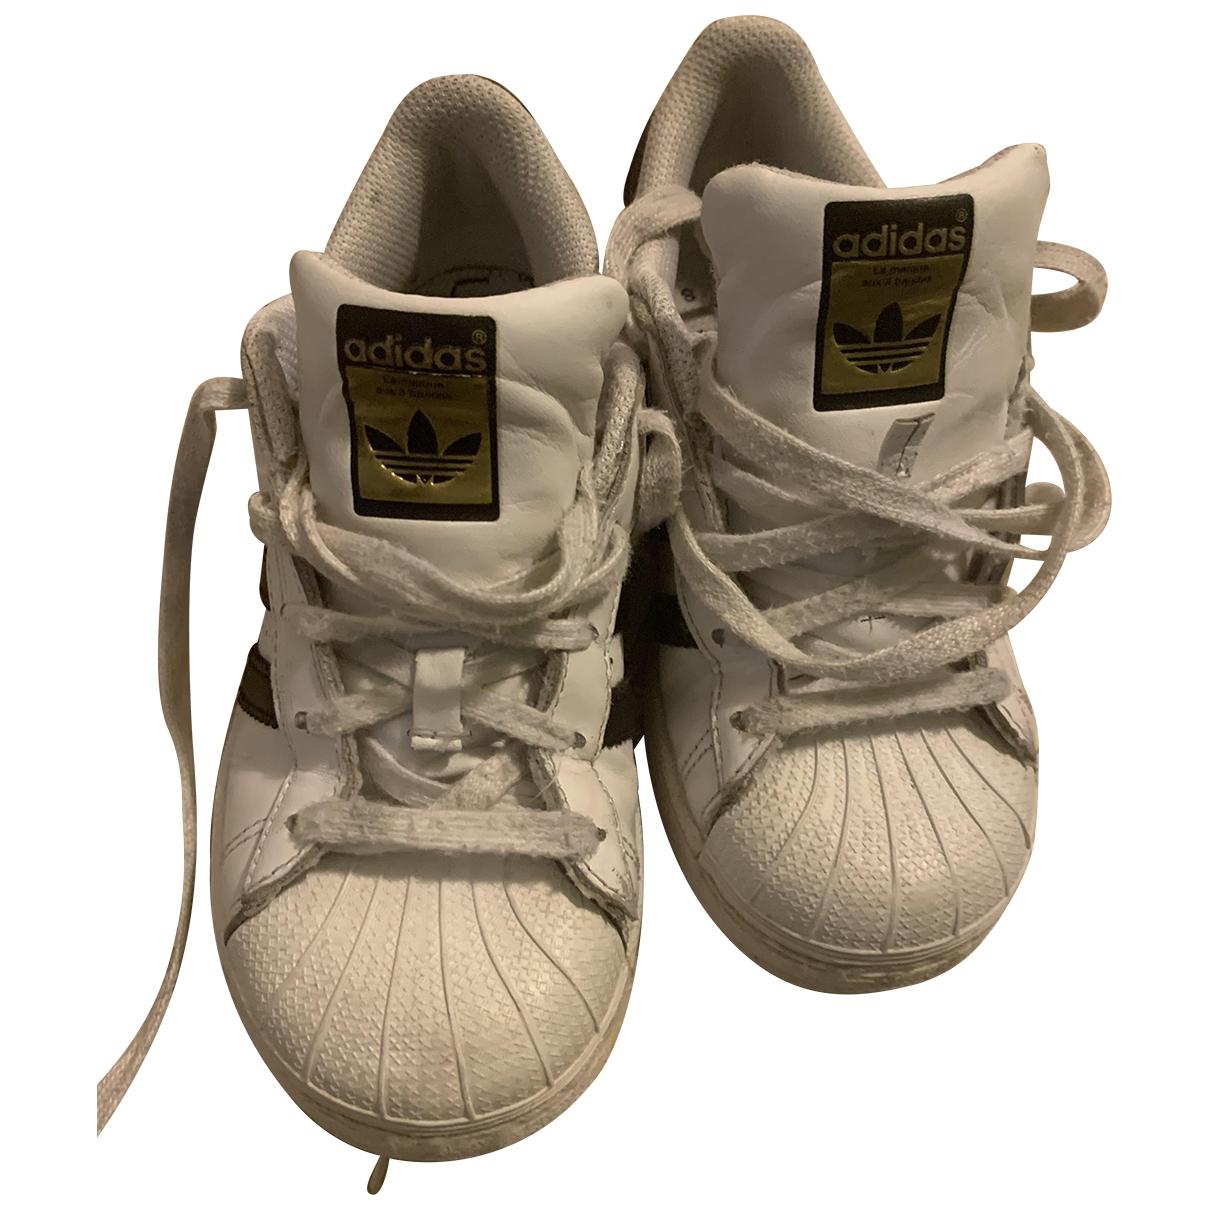 Adidas - Baskets Superstar pour enfant en cuir - blanc